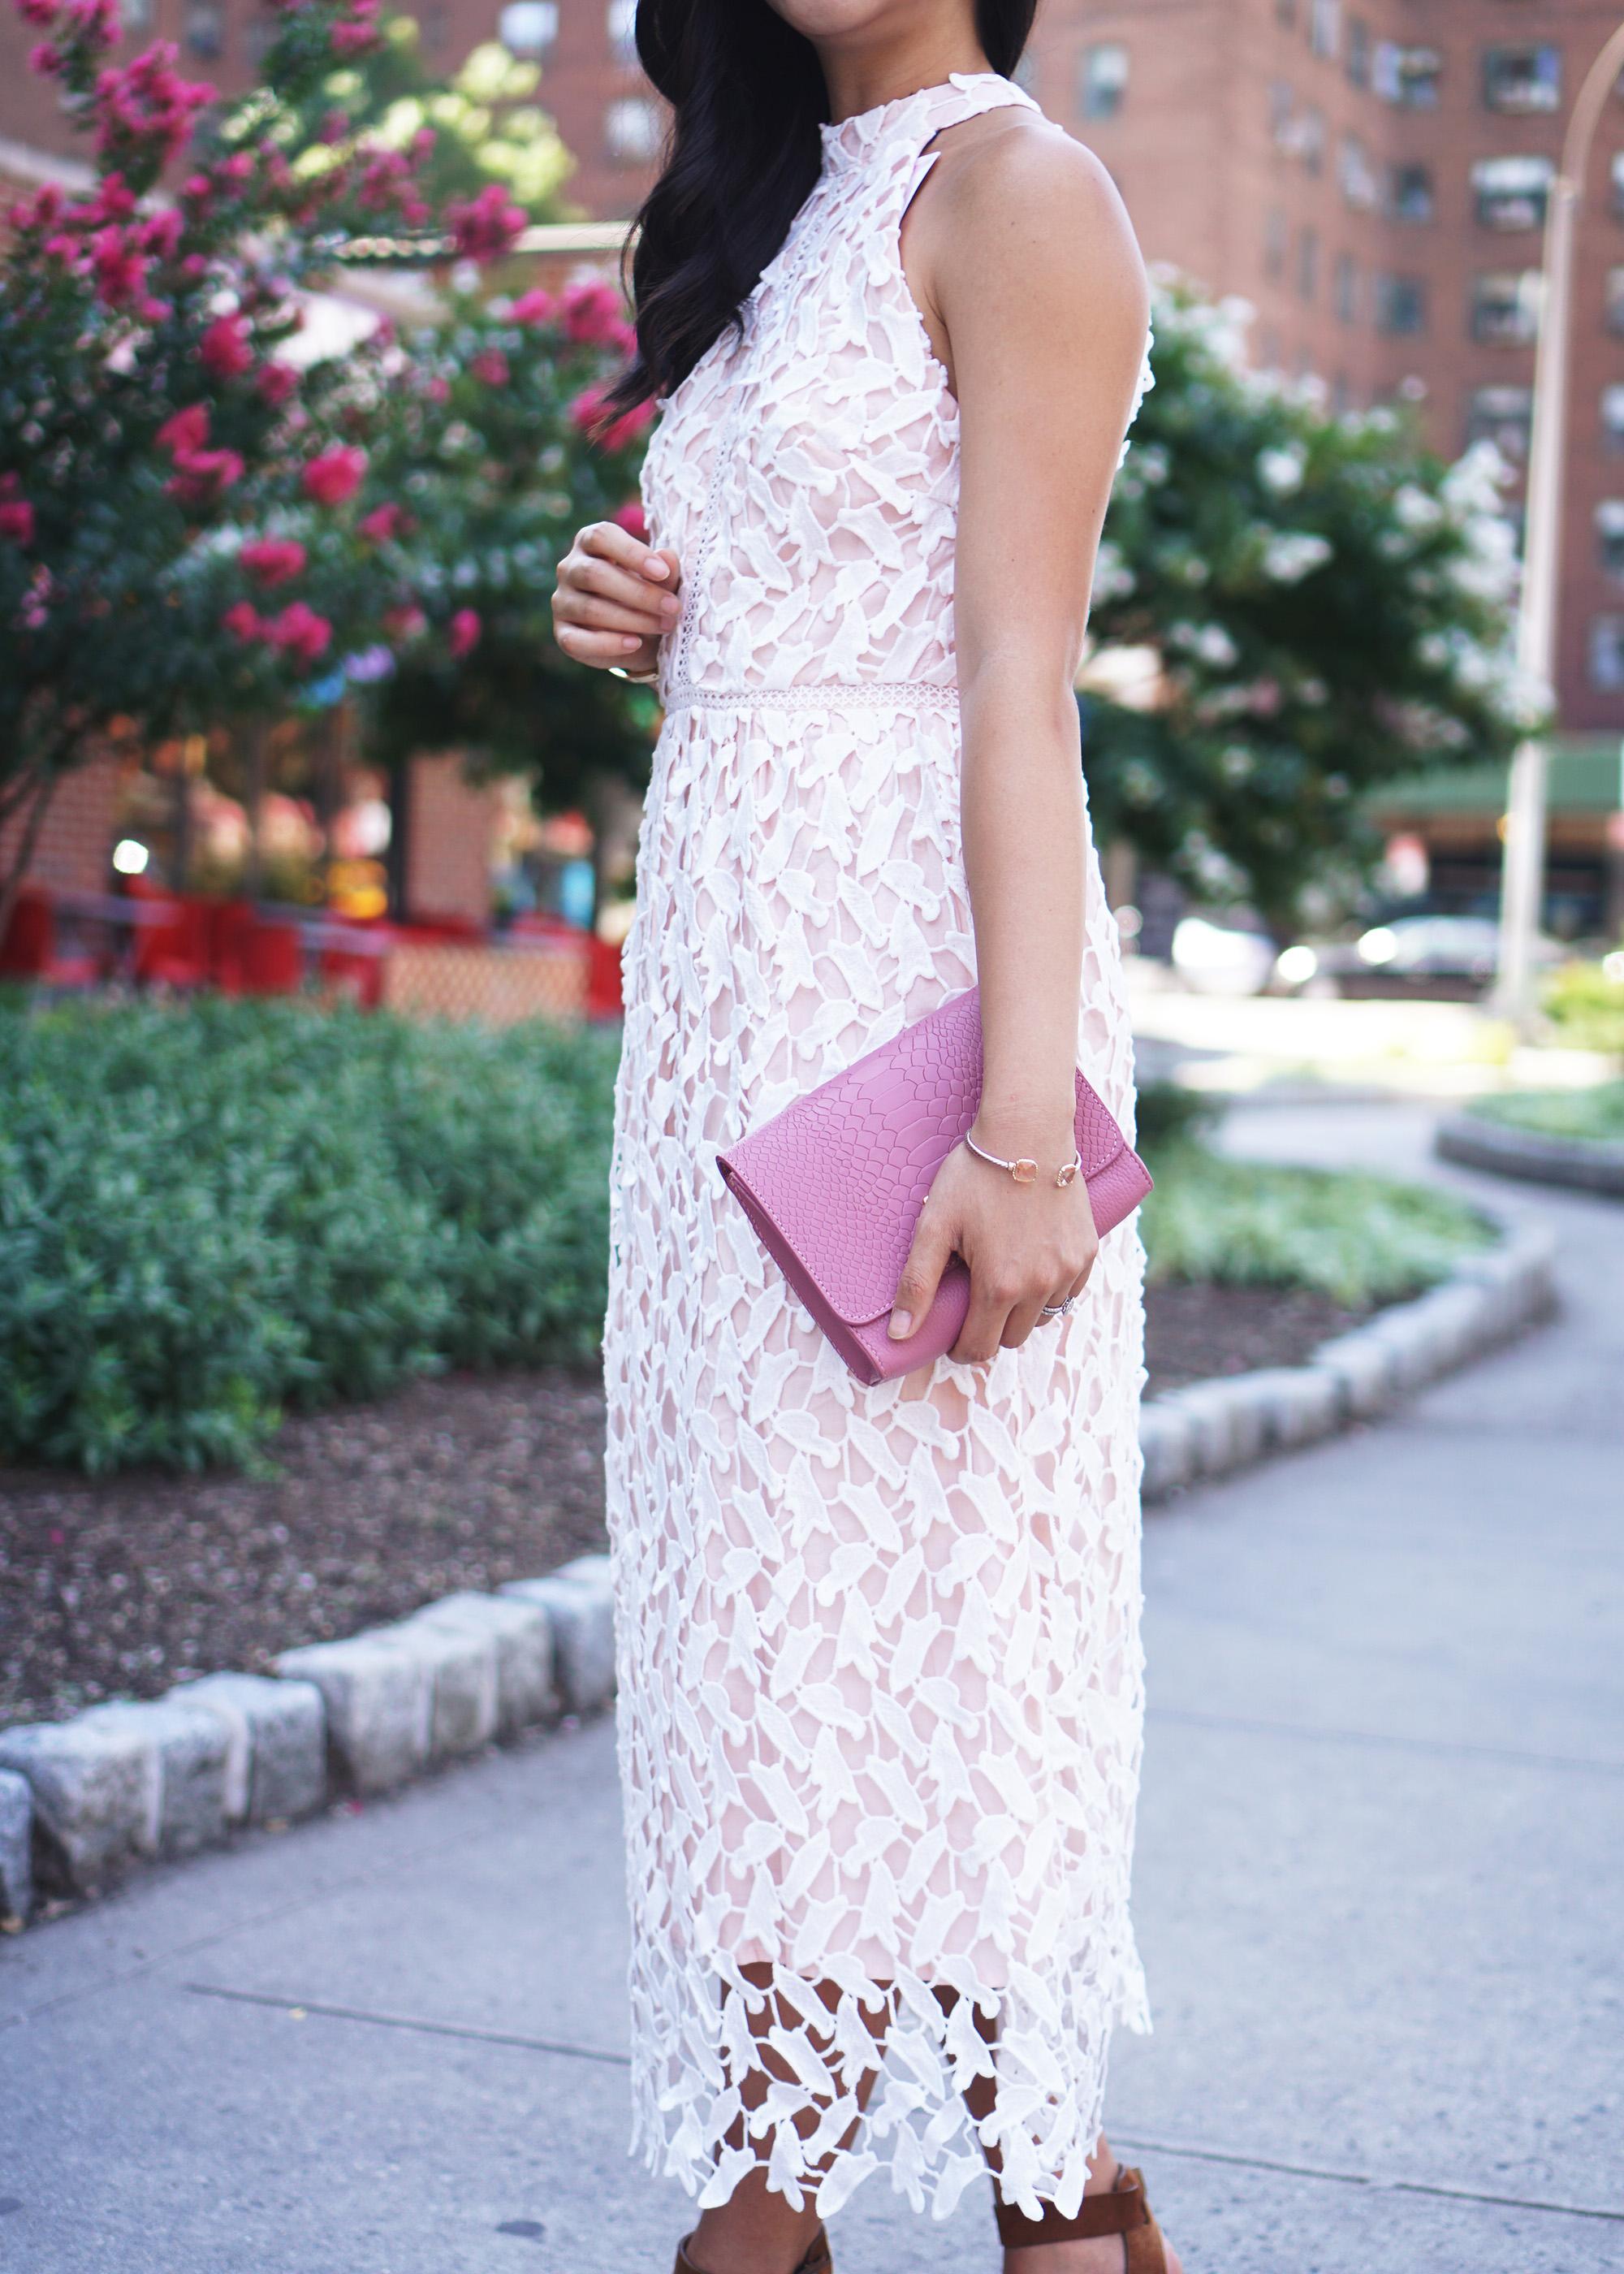 Summer Style Inspiration: White Lace Midi Dress